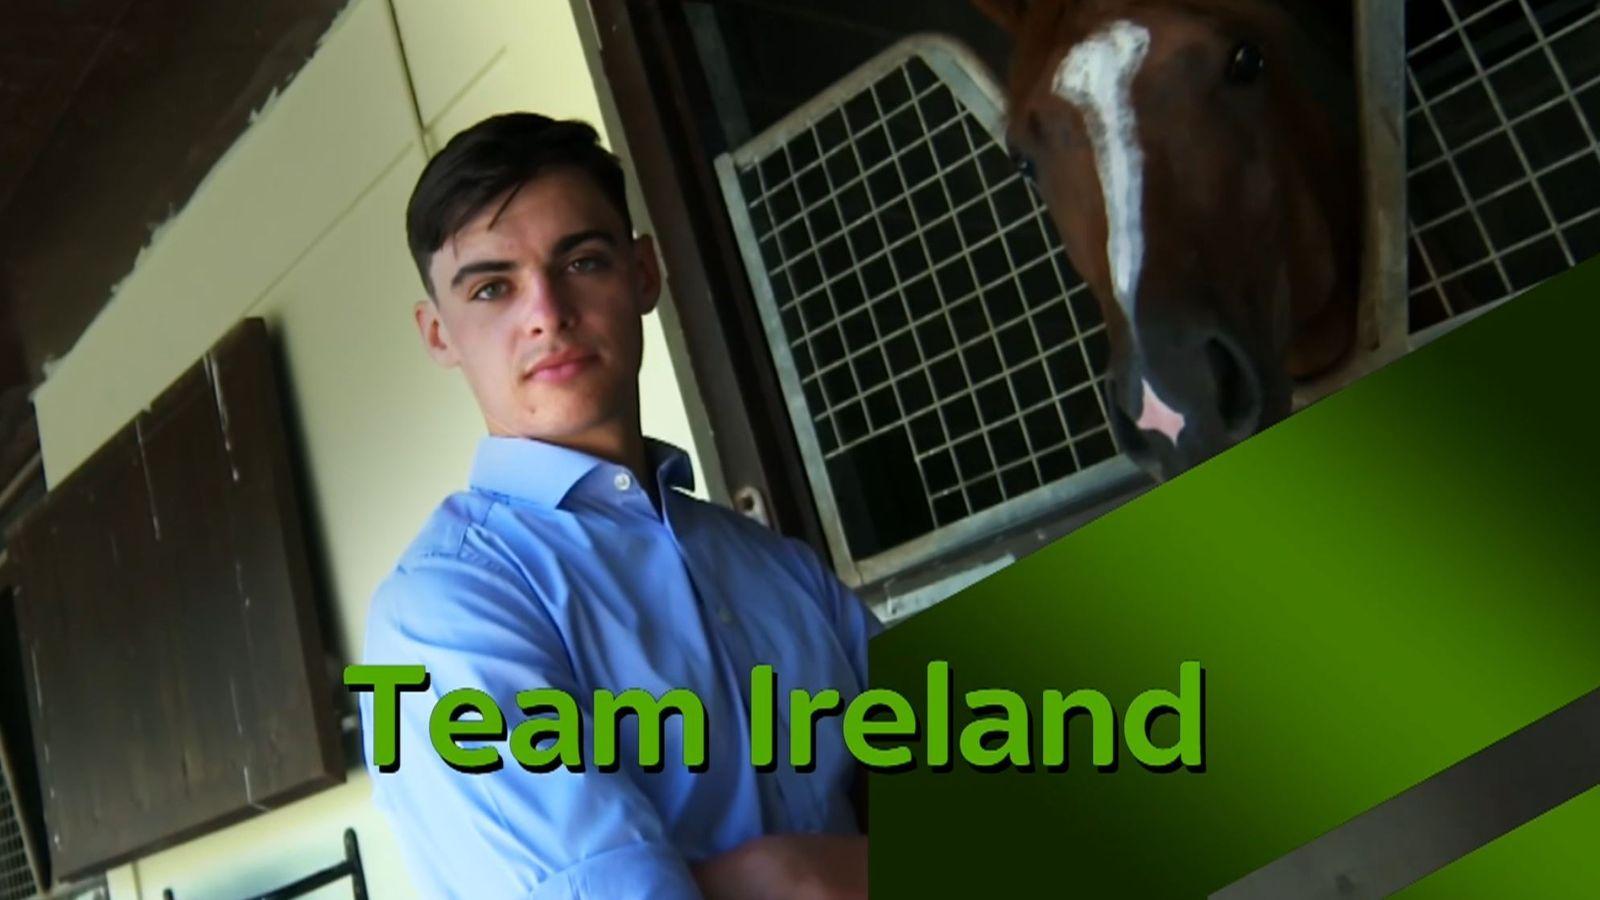 Racing League: Meet Team Ireland featuring Joseph O'Brien, Donnacha O'Brien, David Egan, Gavin Ryan and Dylan Browne McMonagle